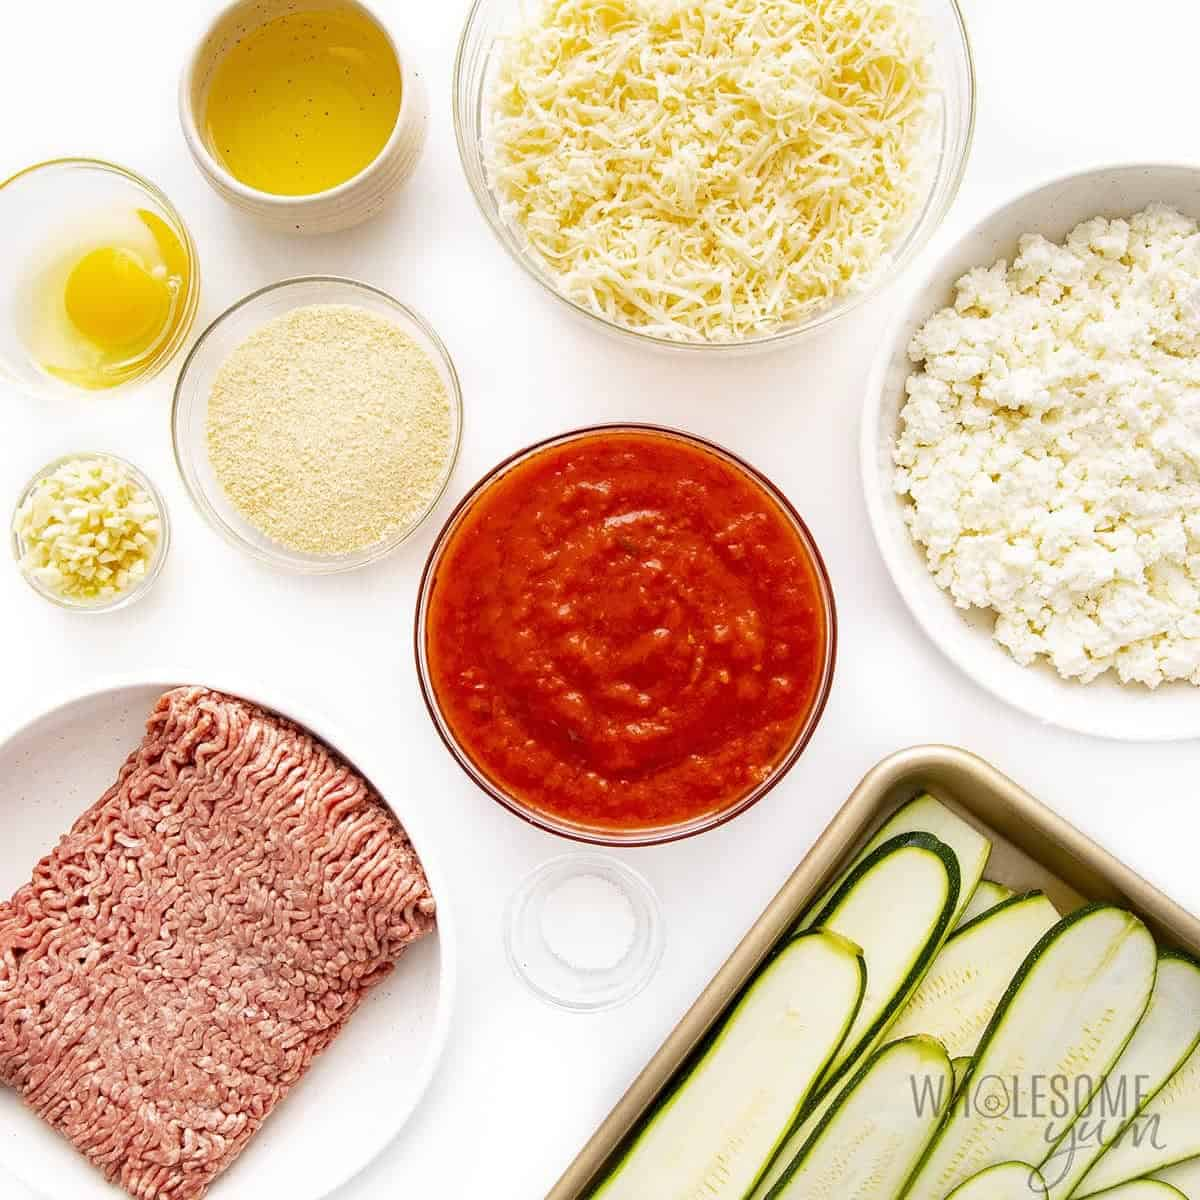 Zucchini lasagna ingredients